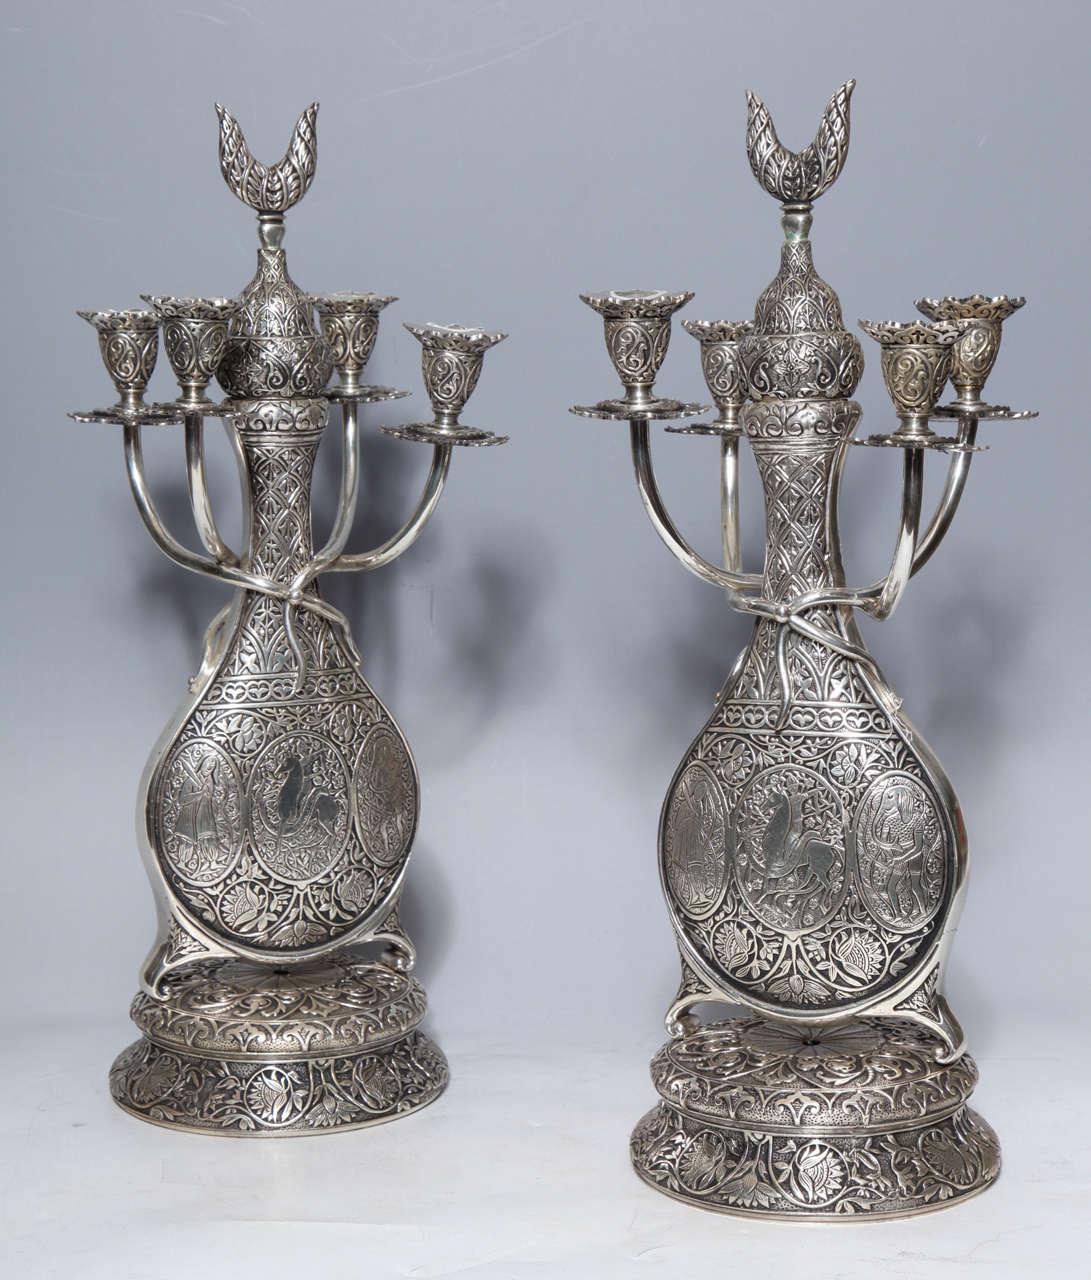 Antique French Orientalist/Islamic 3-Piece Silvered Bronze Clock Garniture For Sale 3